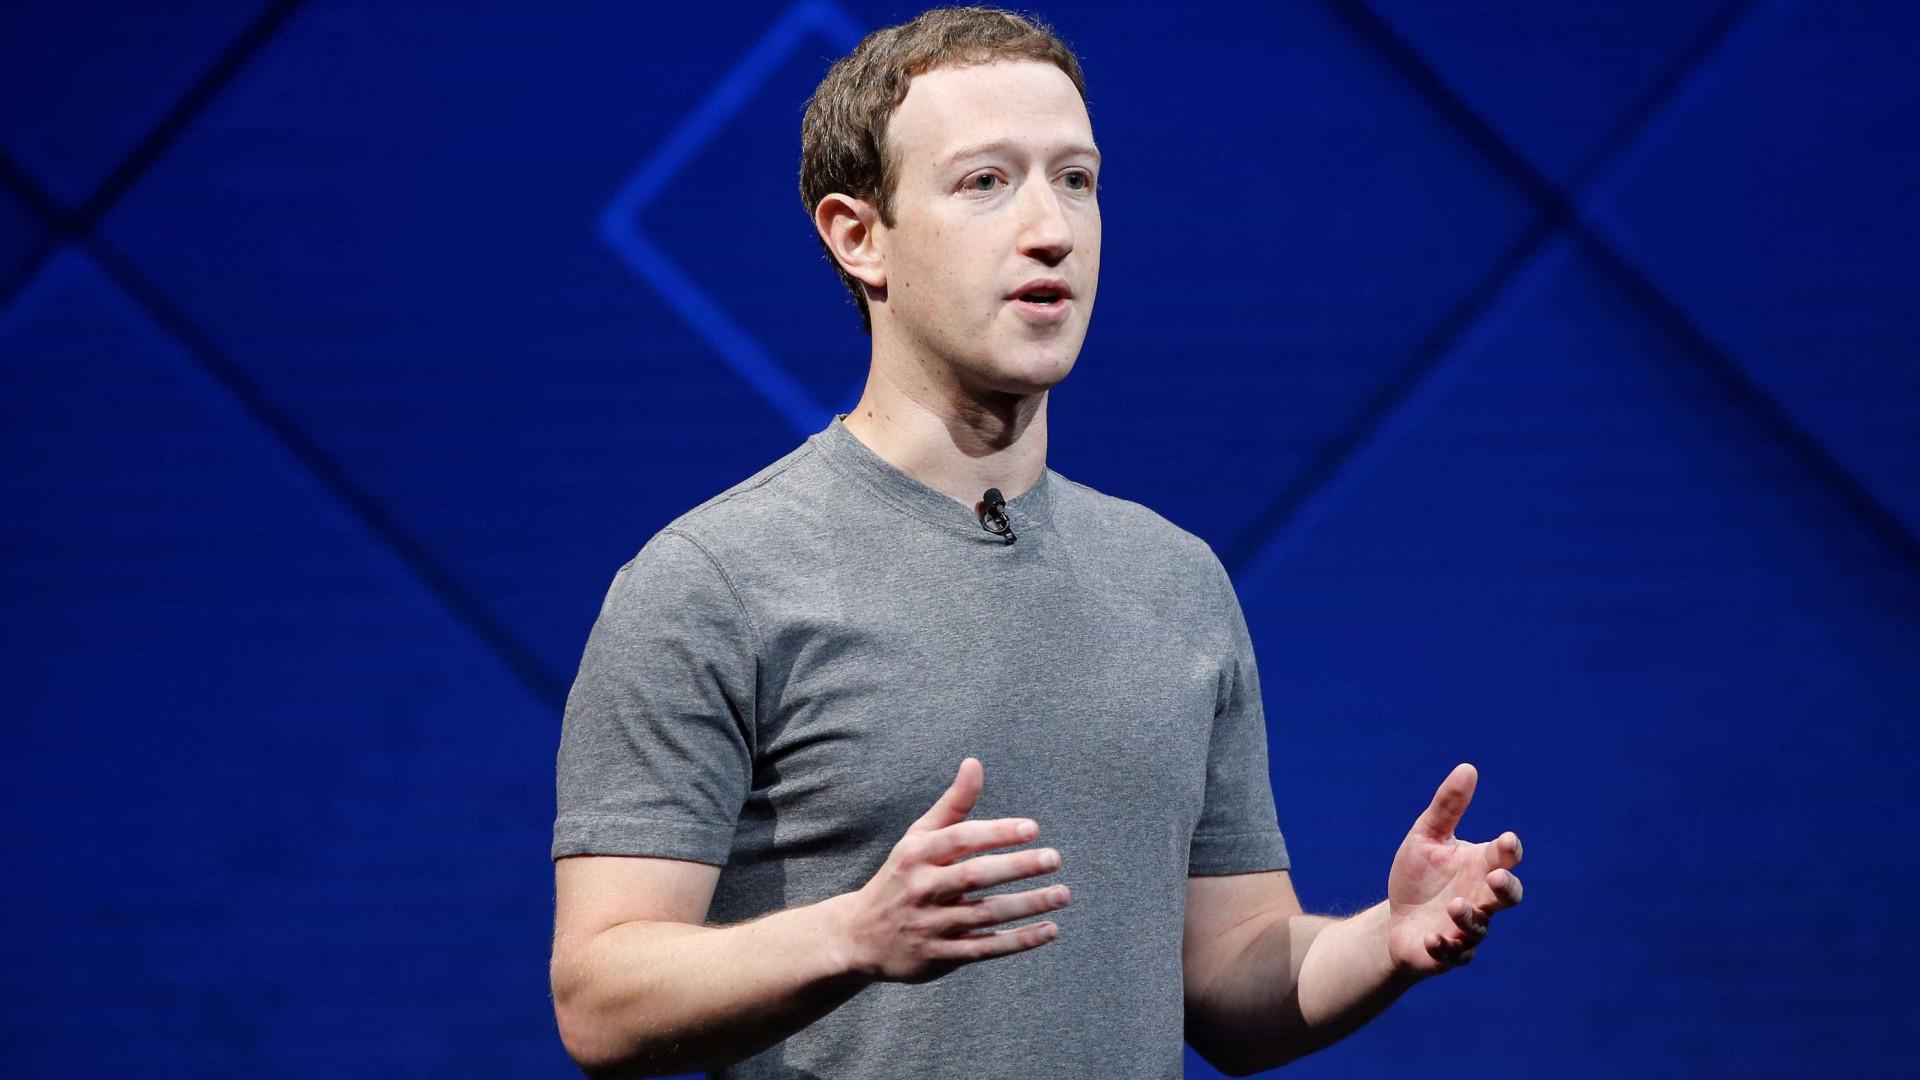 Zuckerberg quer impedir interferência nas eleições do Brasil